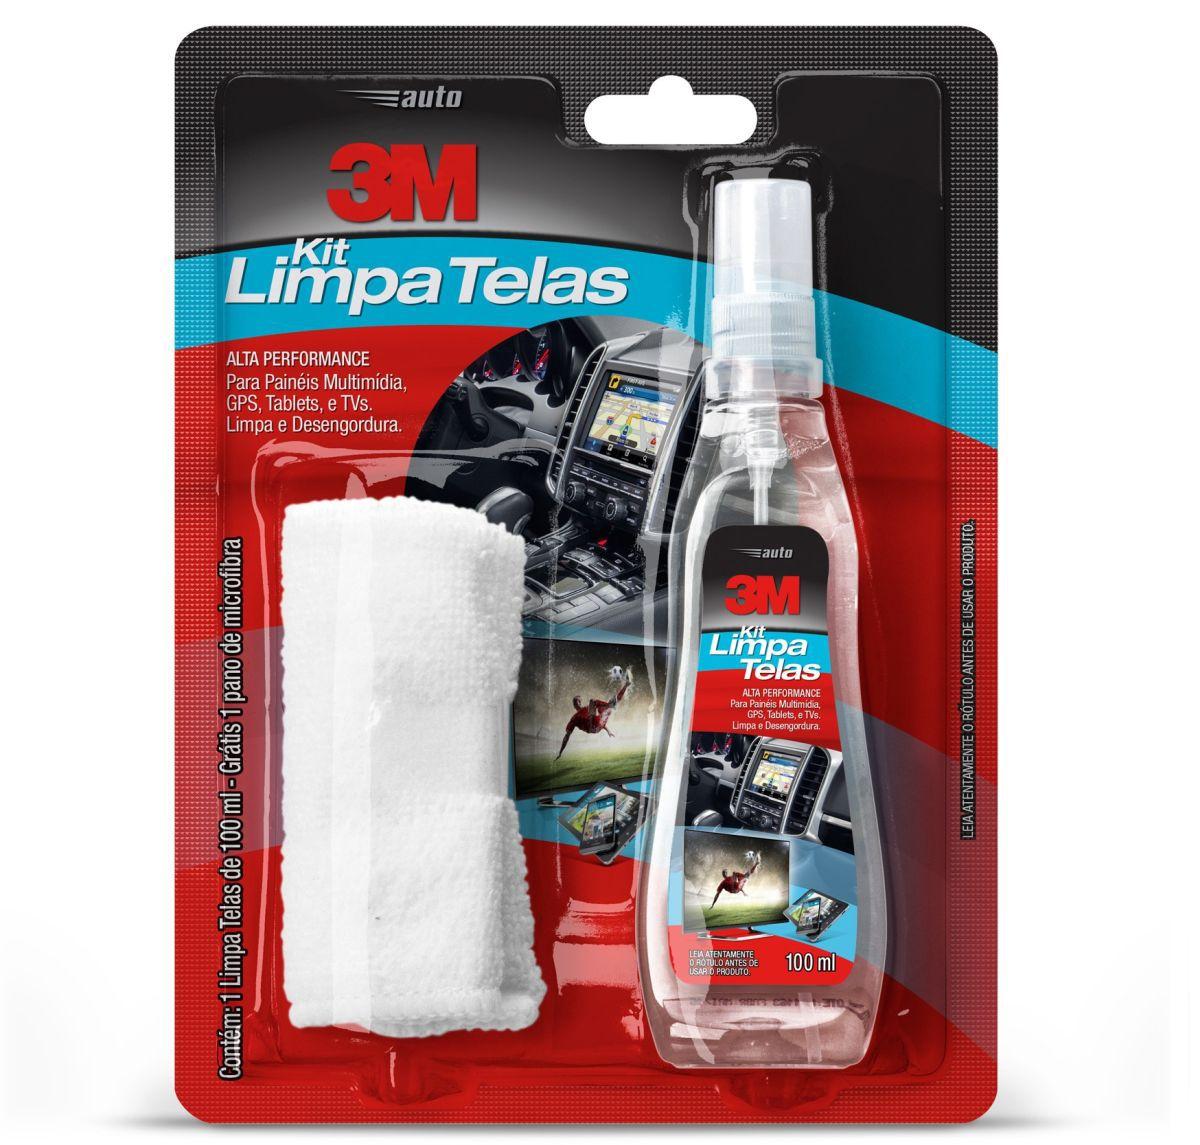 Limpador Alta Performance Kit limpa Telas 100ml com Flanela 3M